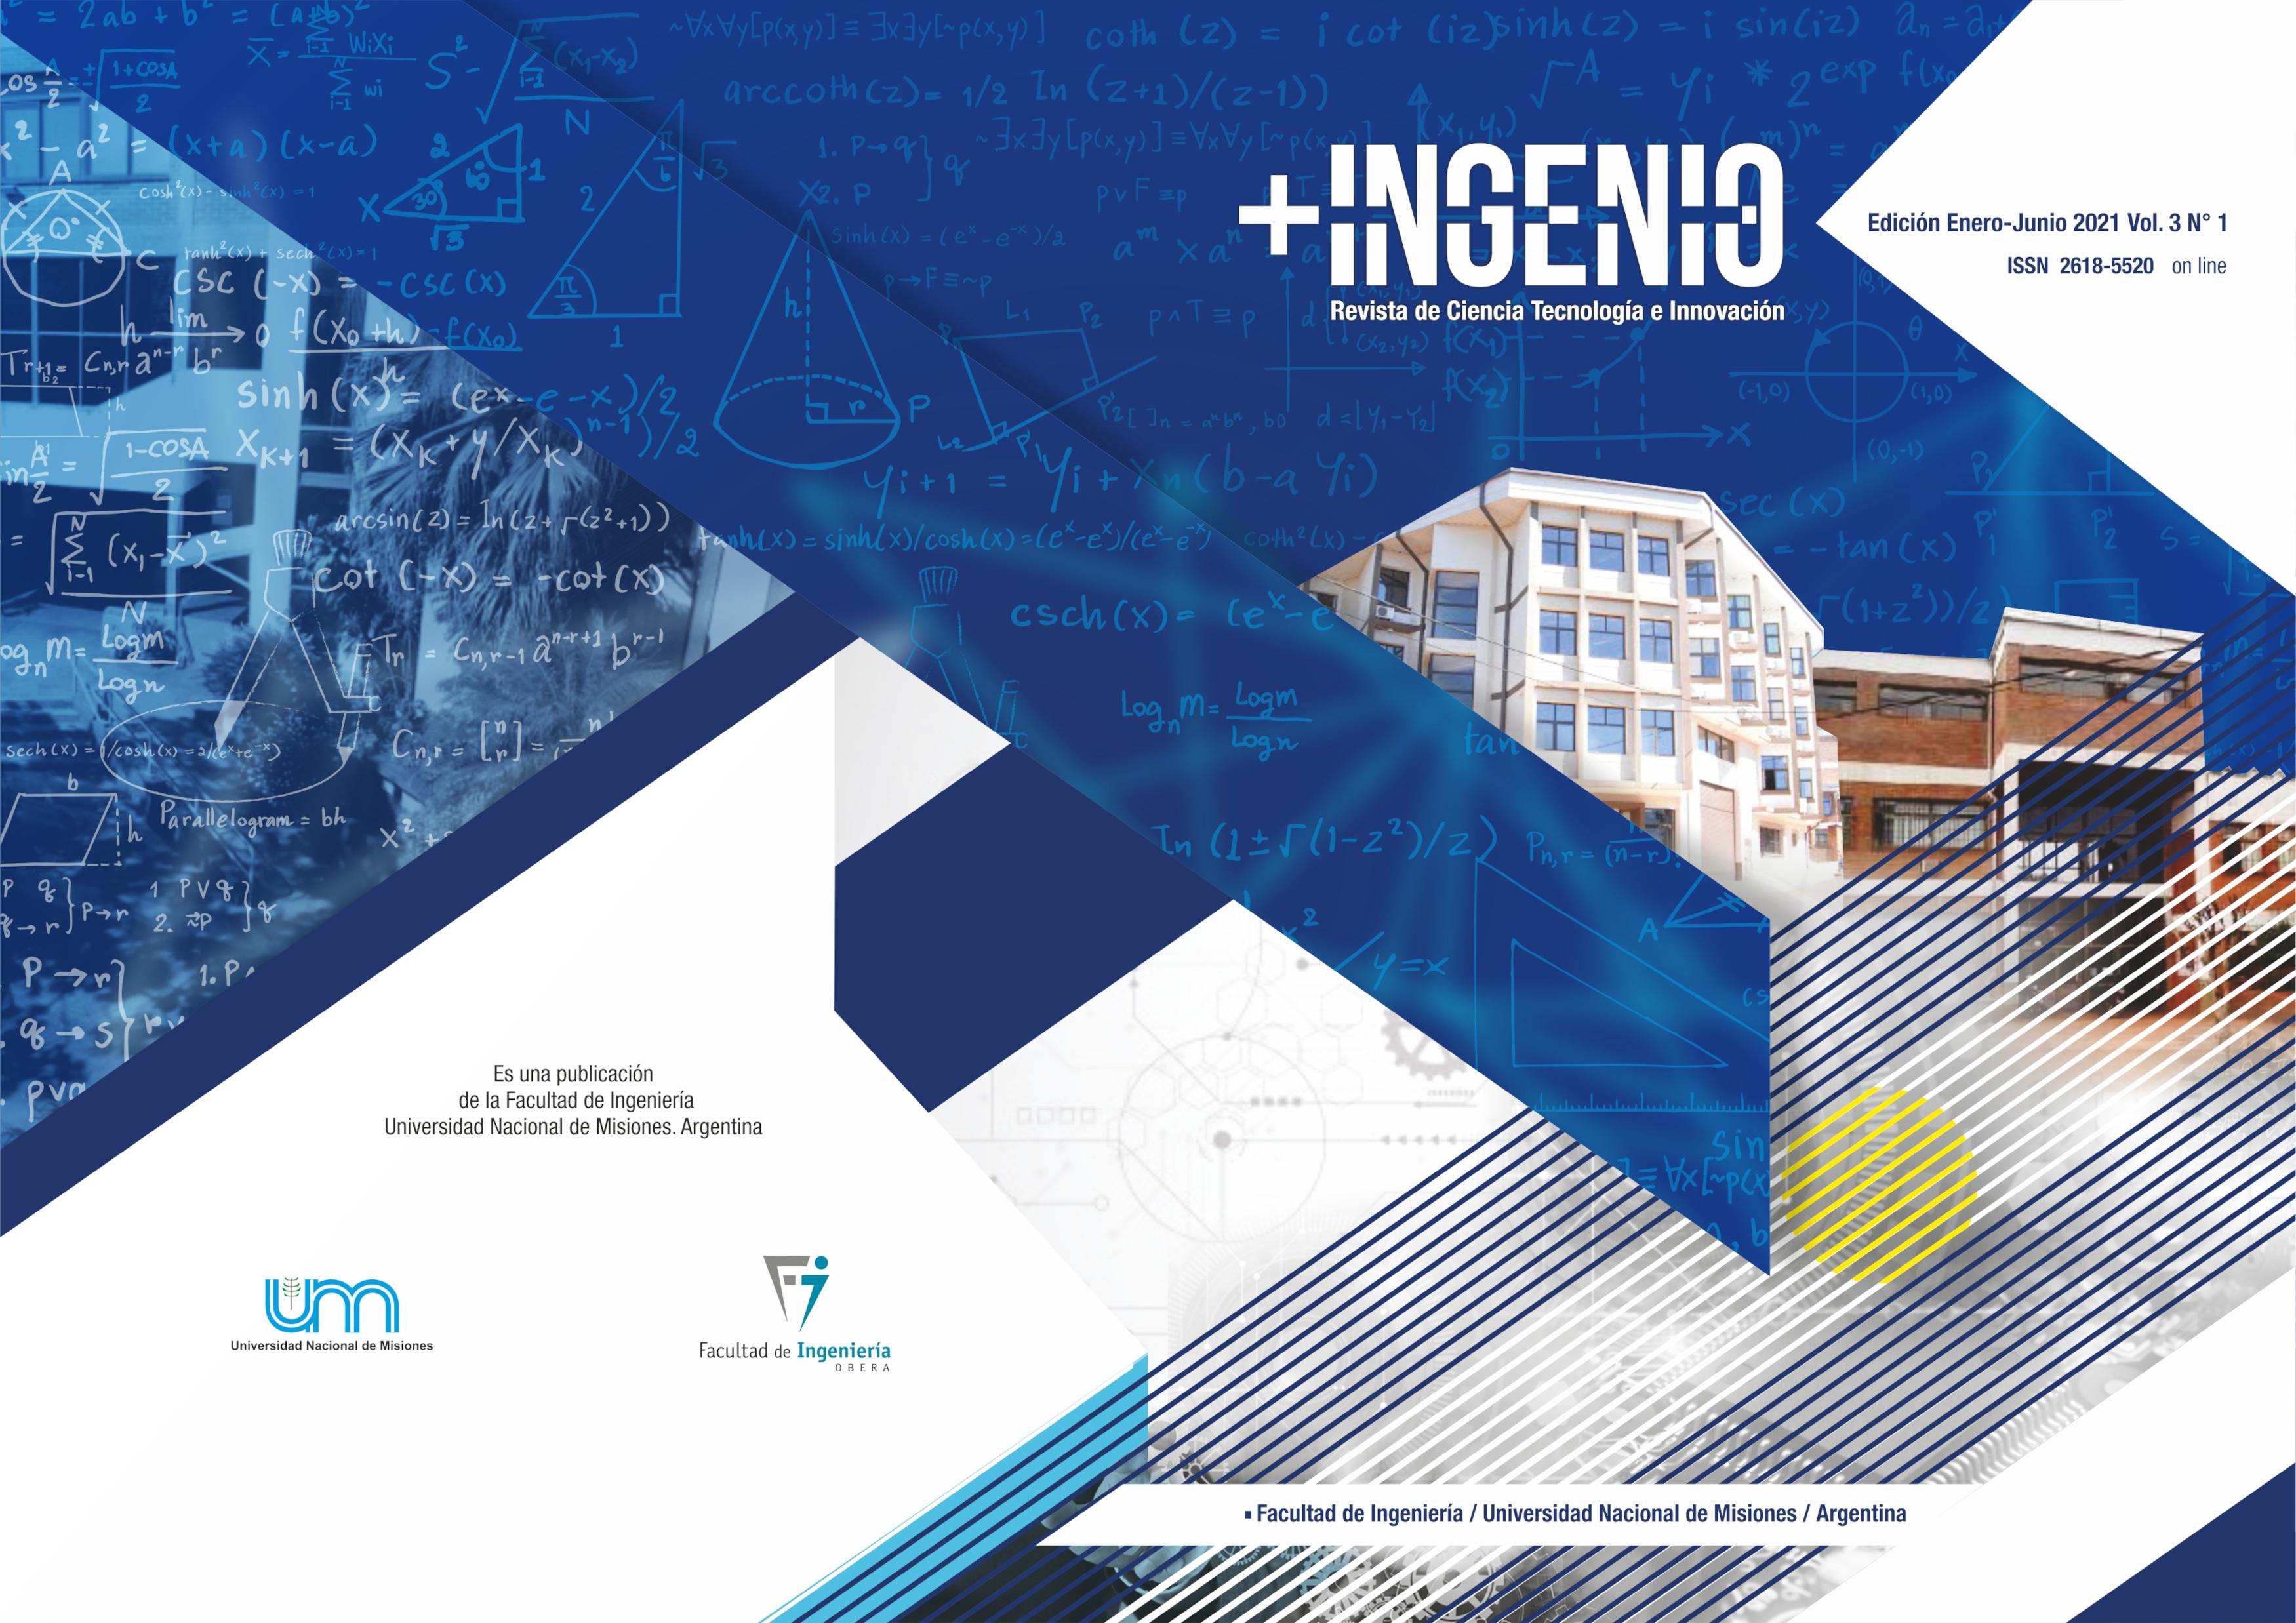 Ver Vol. 3 Núm. 1 (3): Revistas de Ciencia Tecnología e Innovación